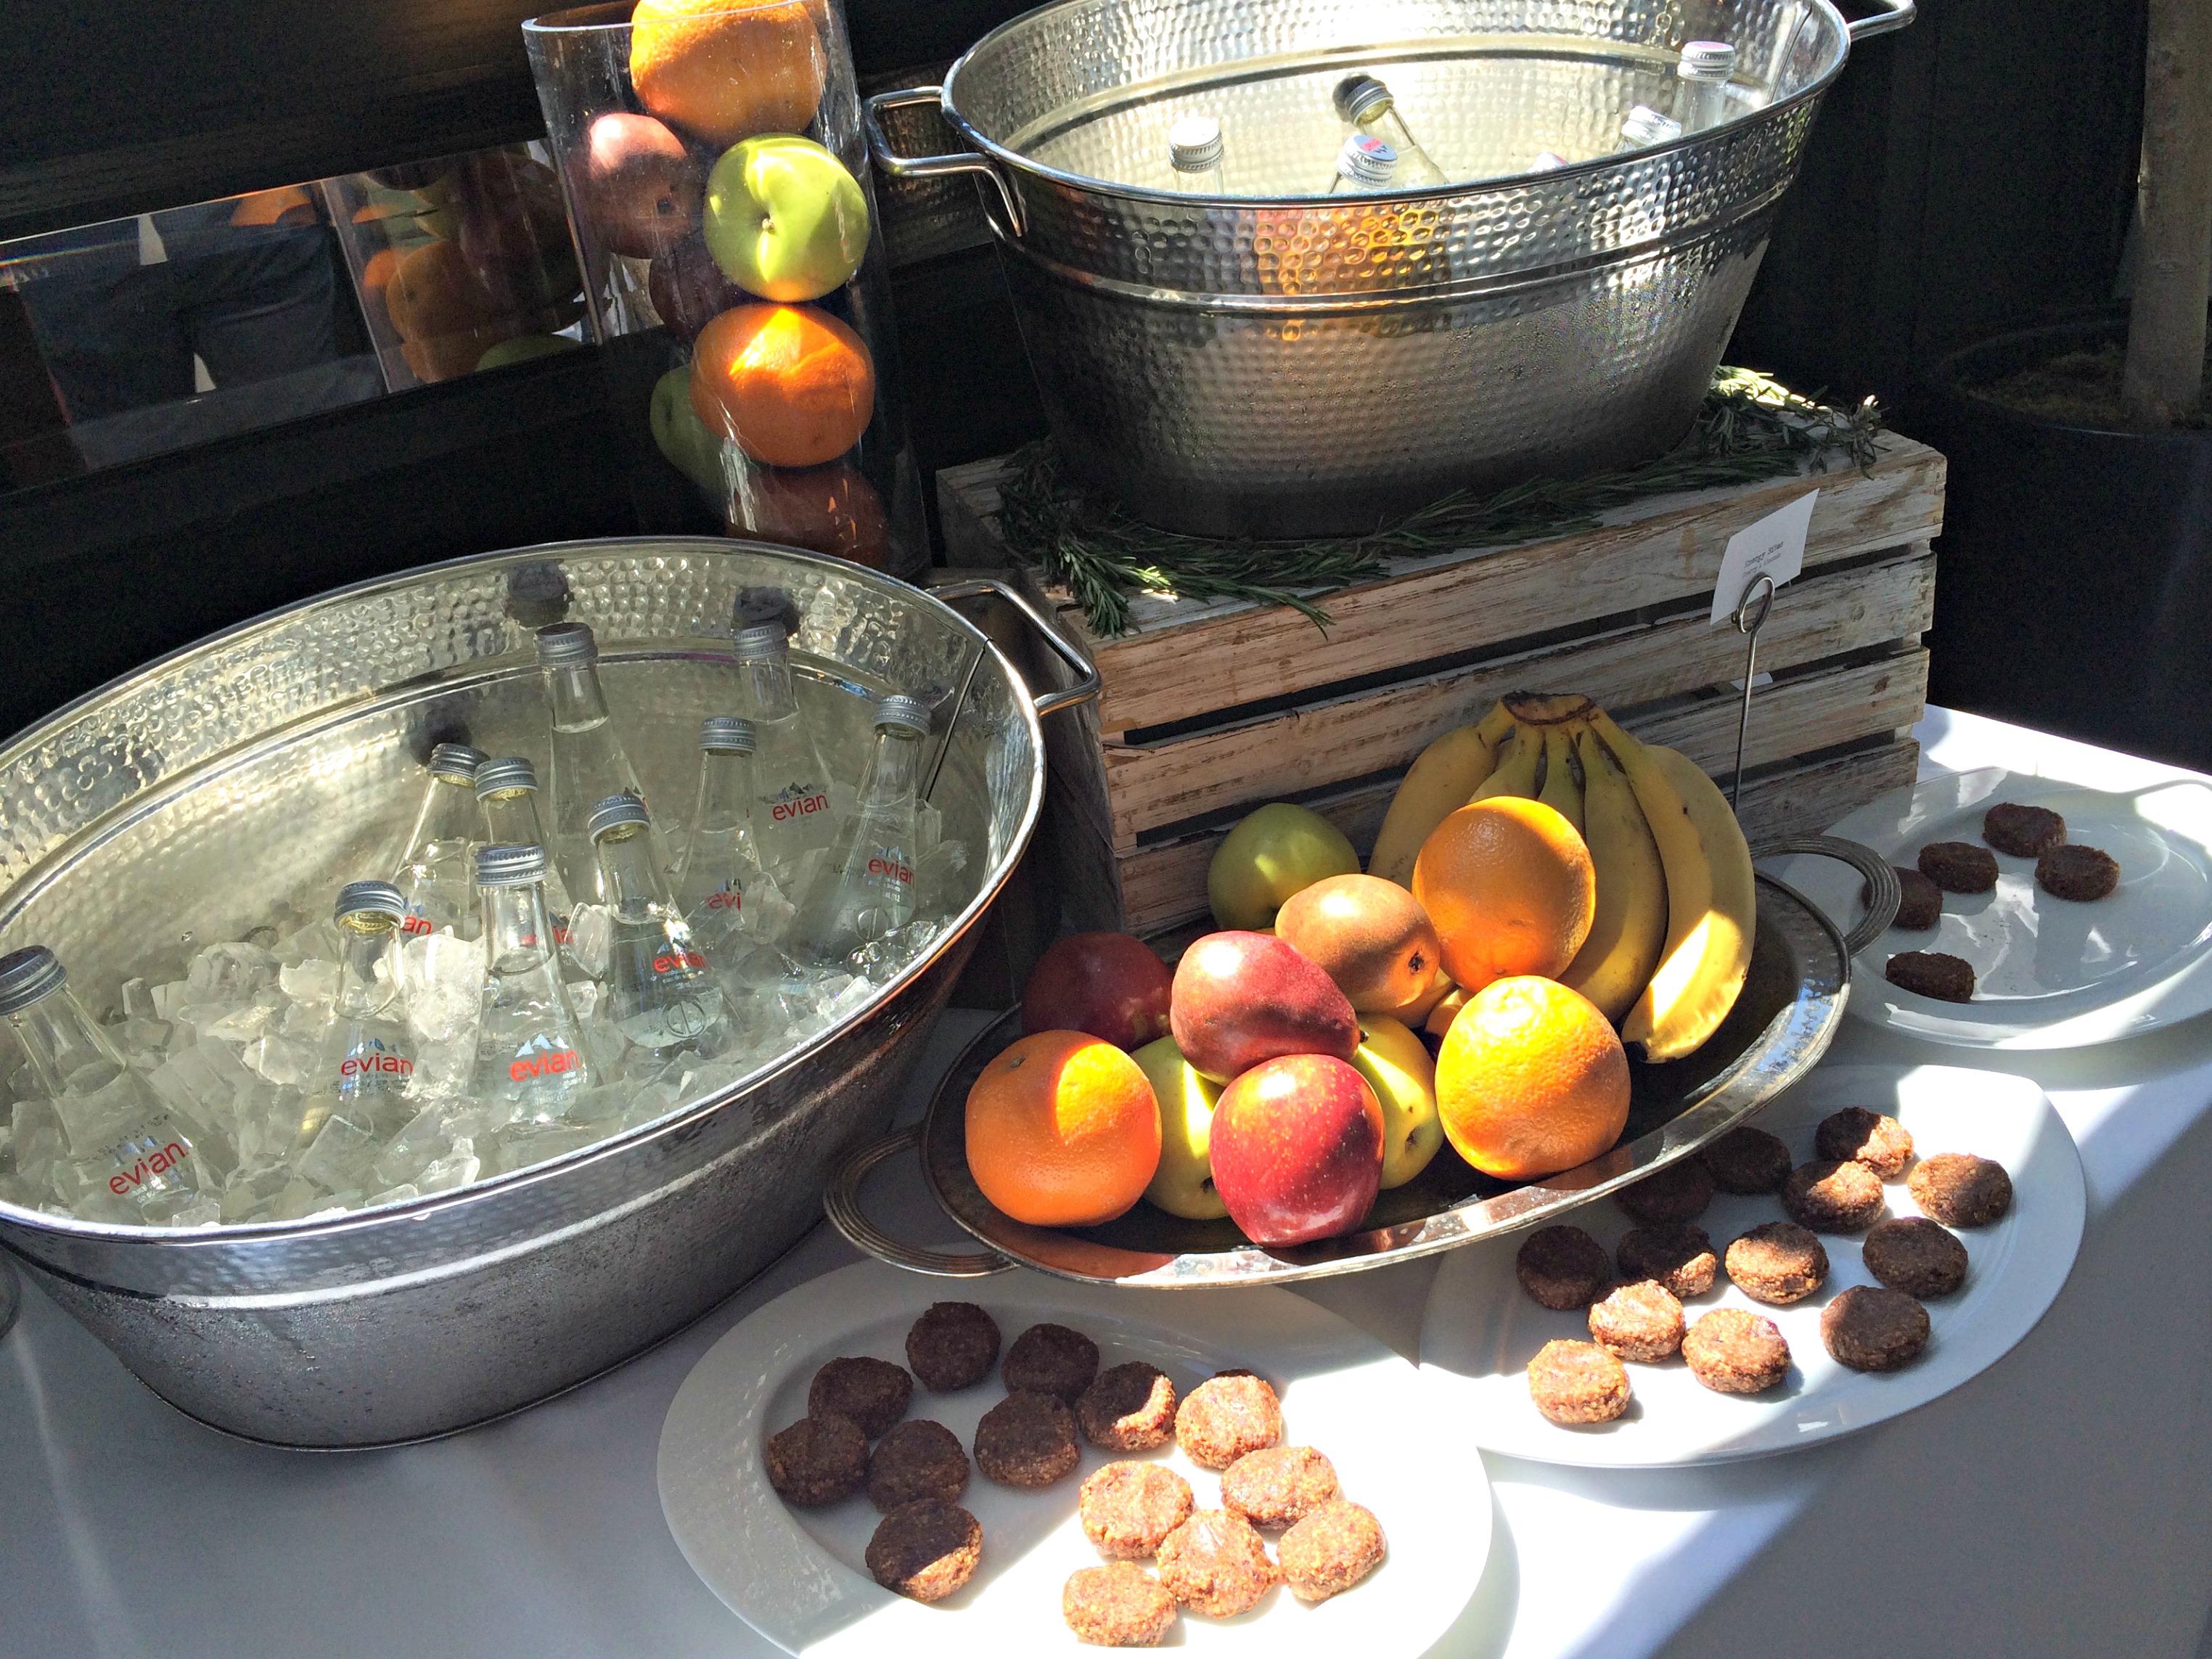 healthy Metamucil snacks and water